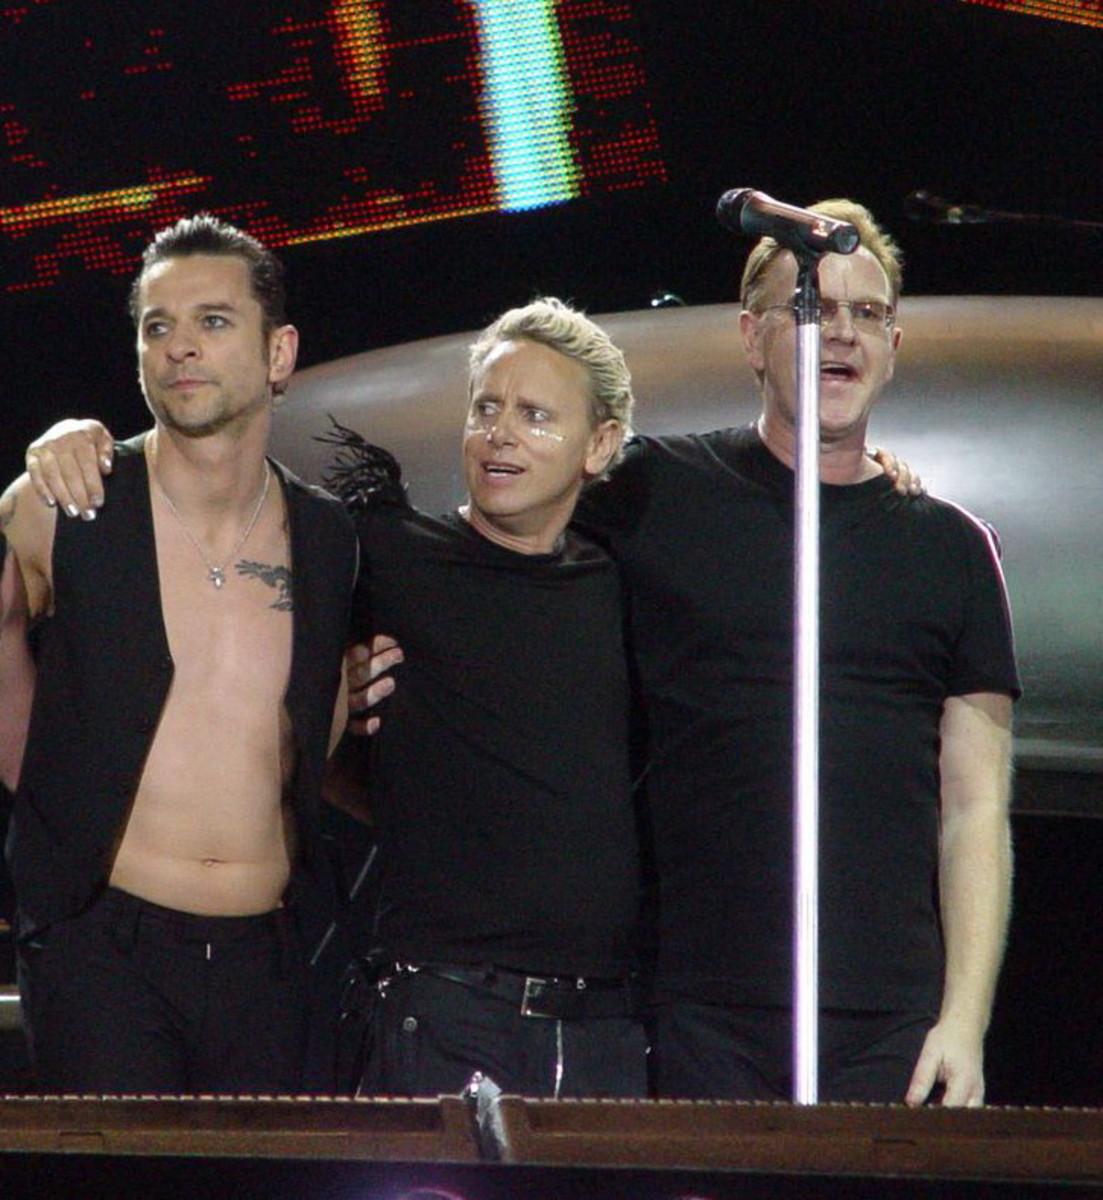 Watch Trailer For Depeche Mode Documentary Following Six Special Fans